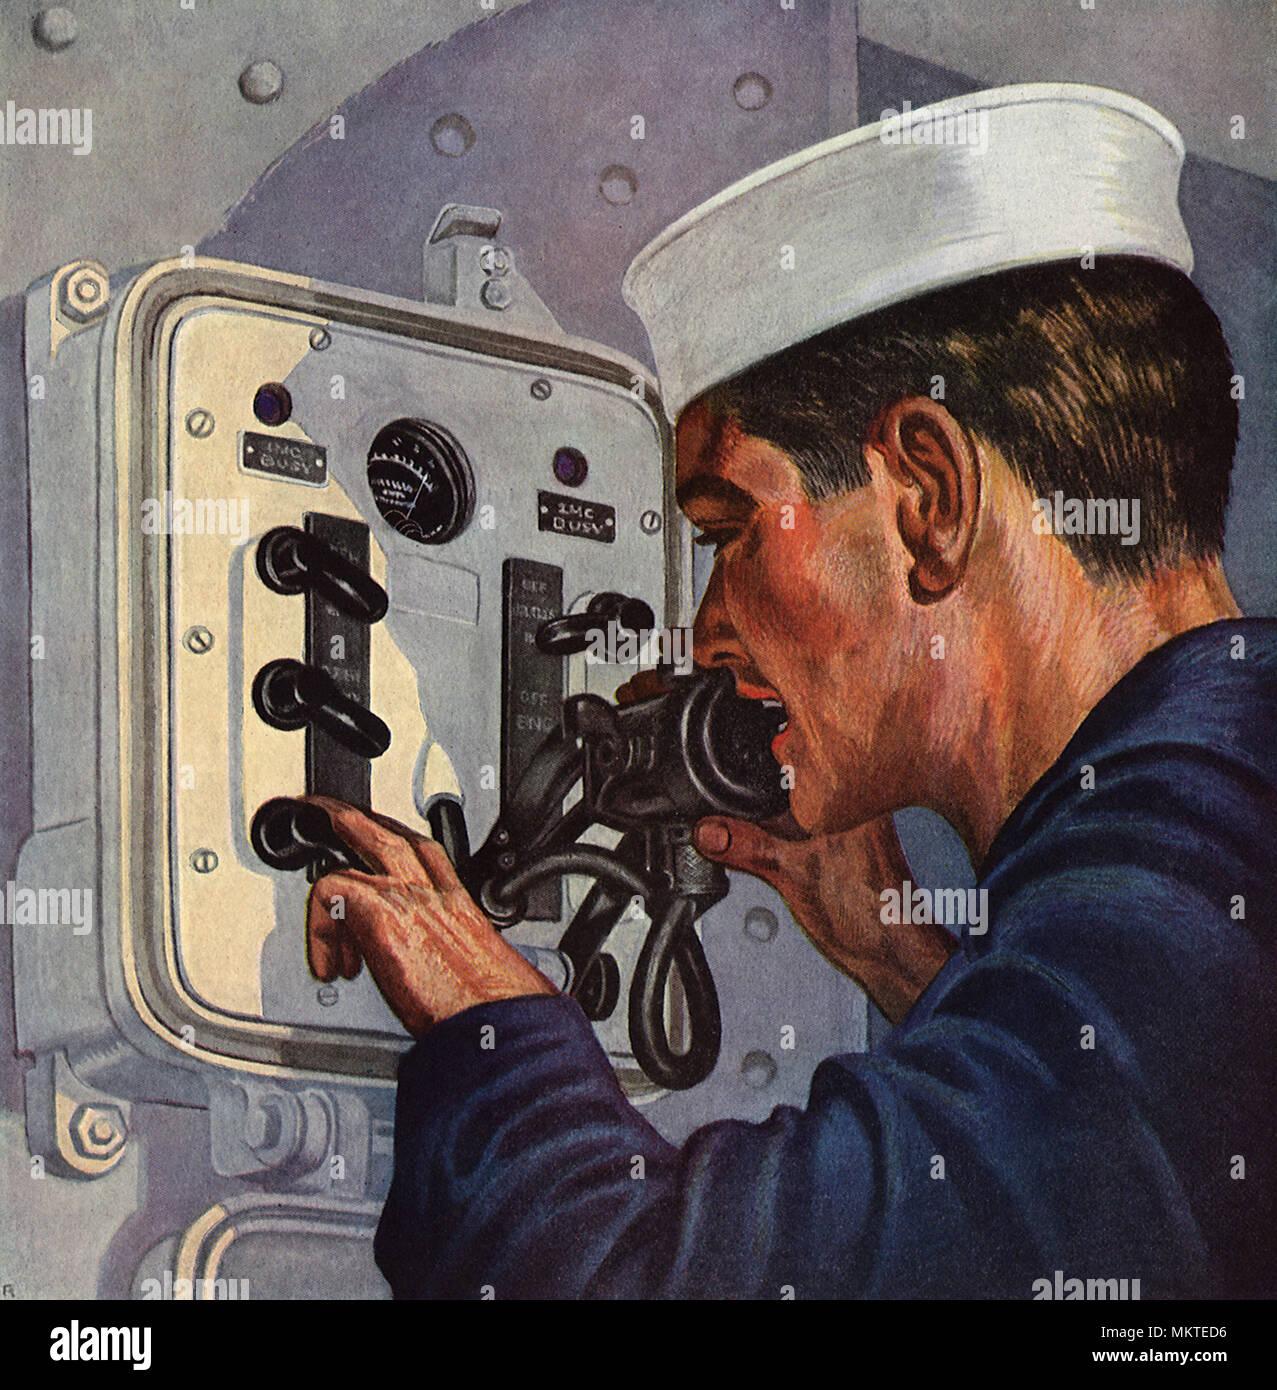 Sailor on Loud-speaking Telephone - Stock Image